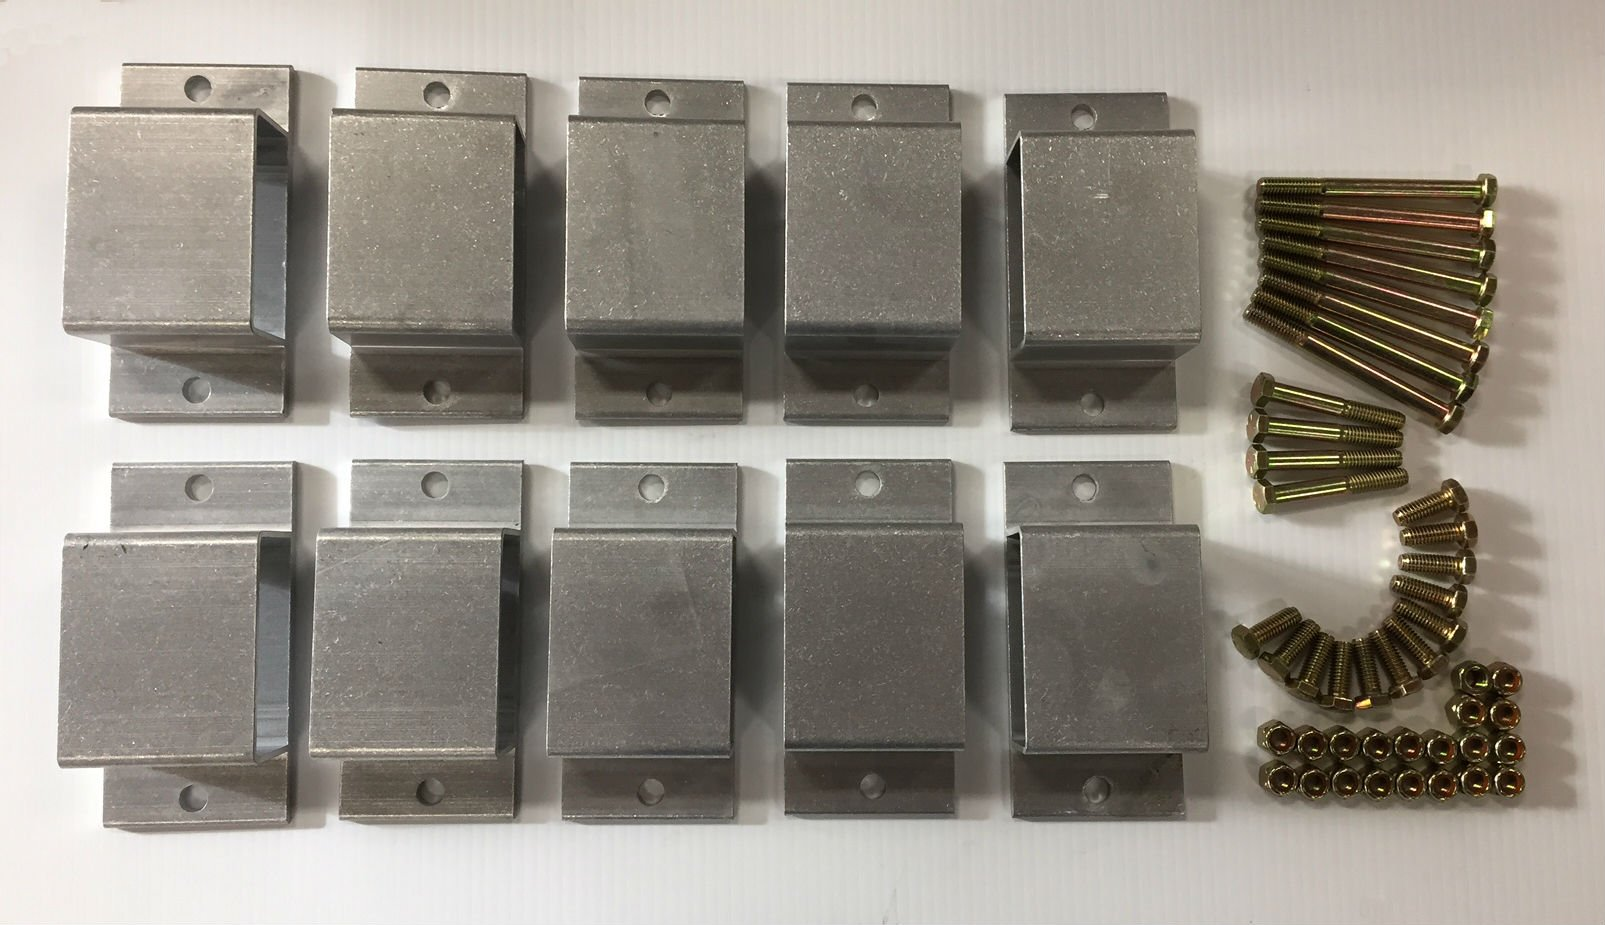 Triton 02784 Aluminum Stake Pocket Kit with 10 Pockets by Triton